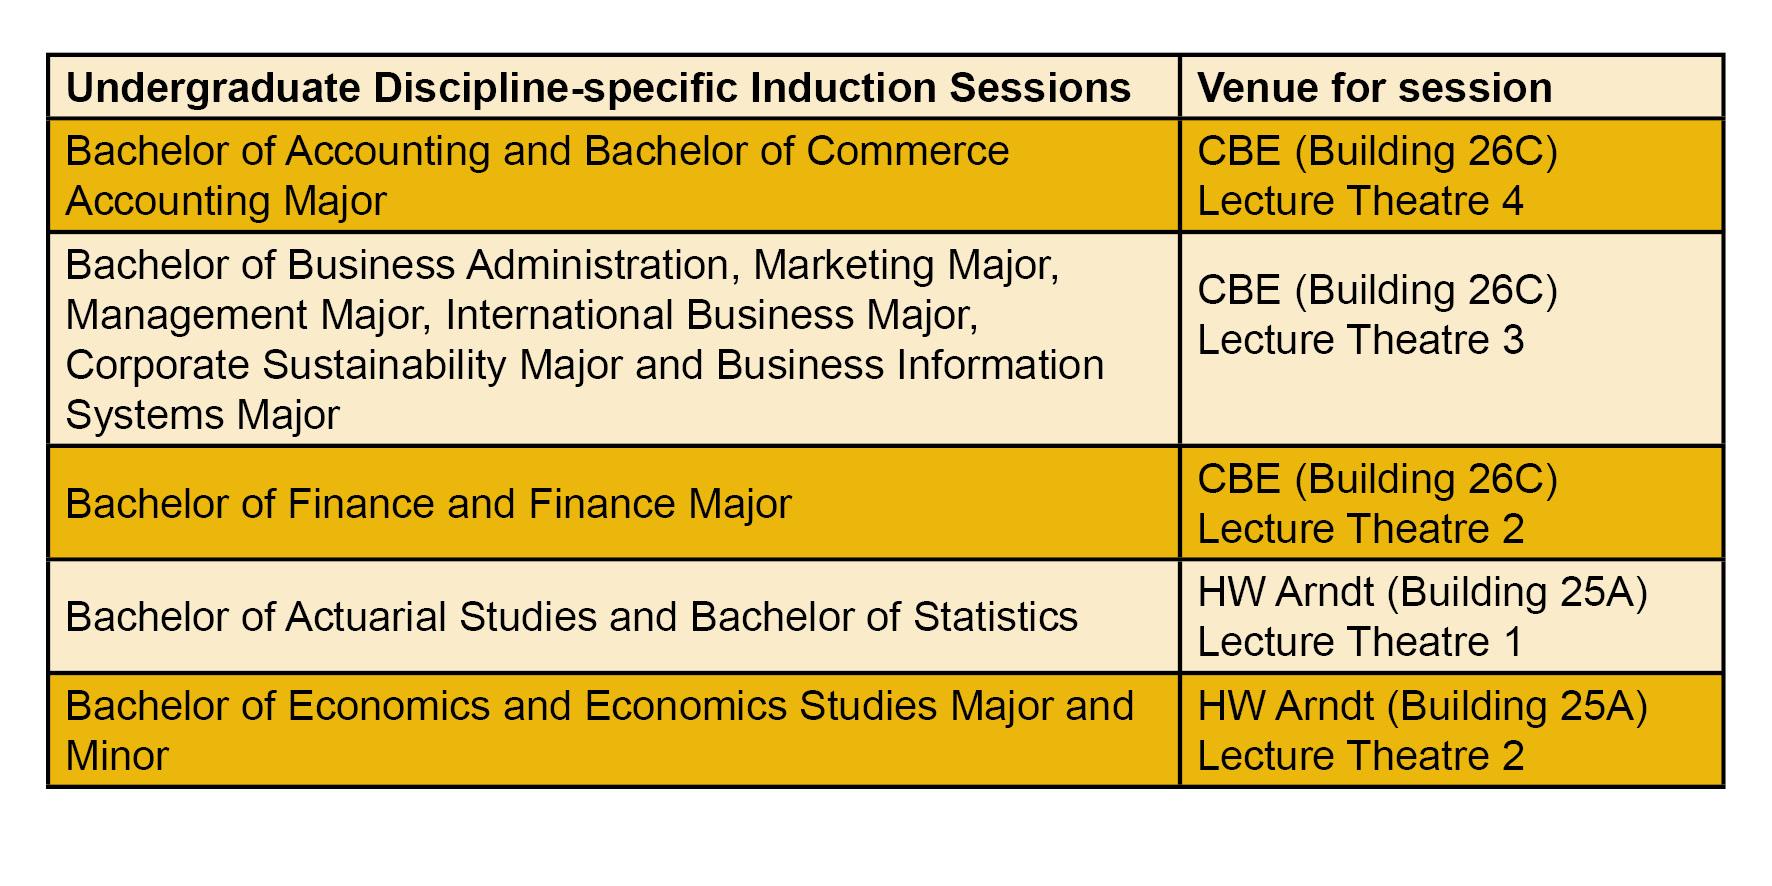 CBE Undergraduate Inductions Sessions list